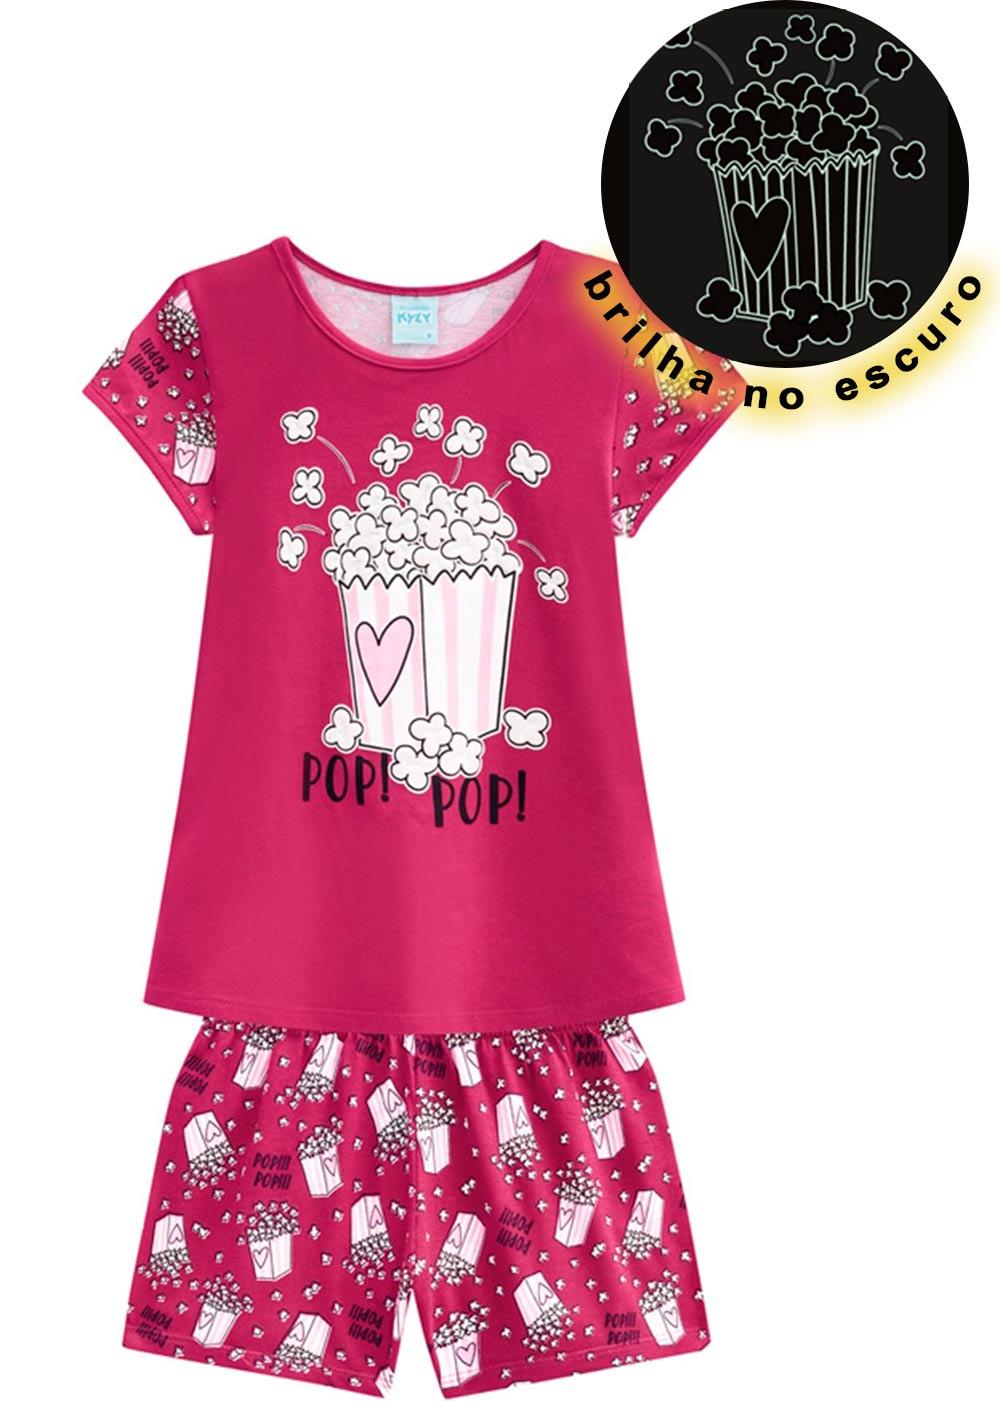 Pijama Infantil Feminino Verão Rosa Popcorn Kyly